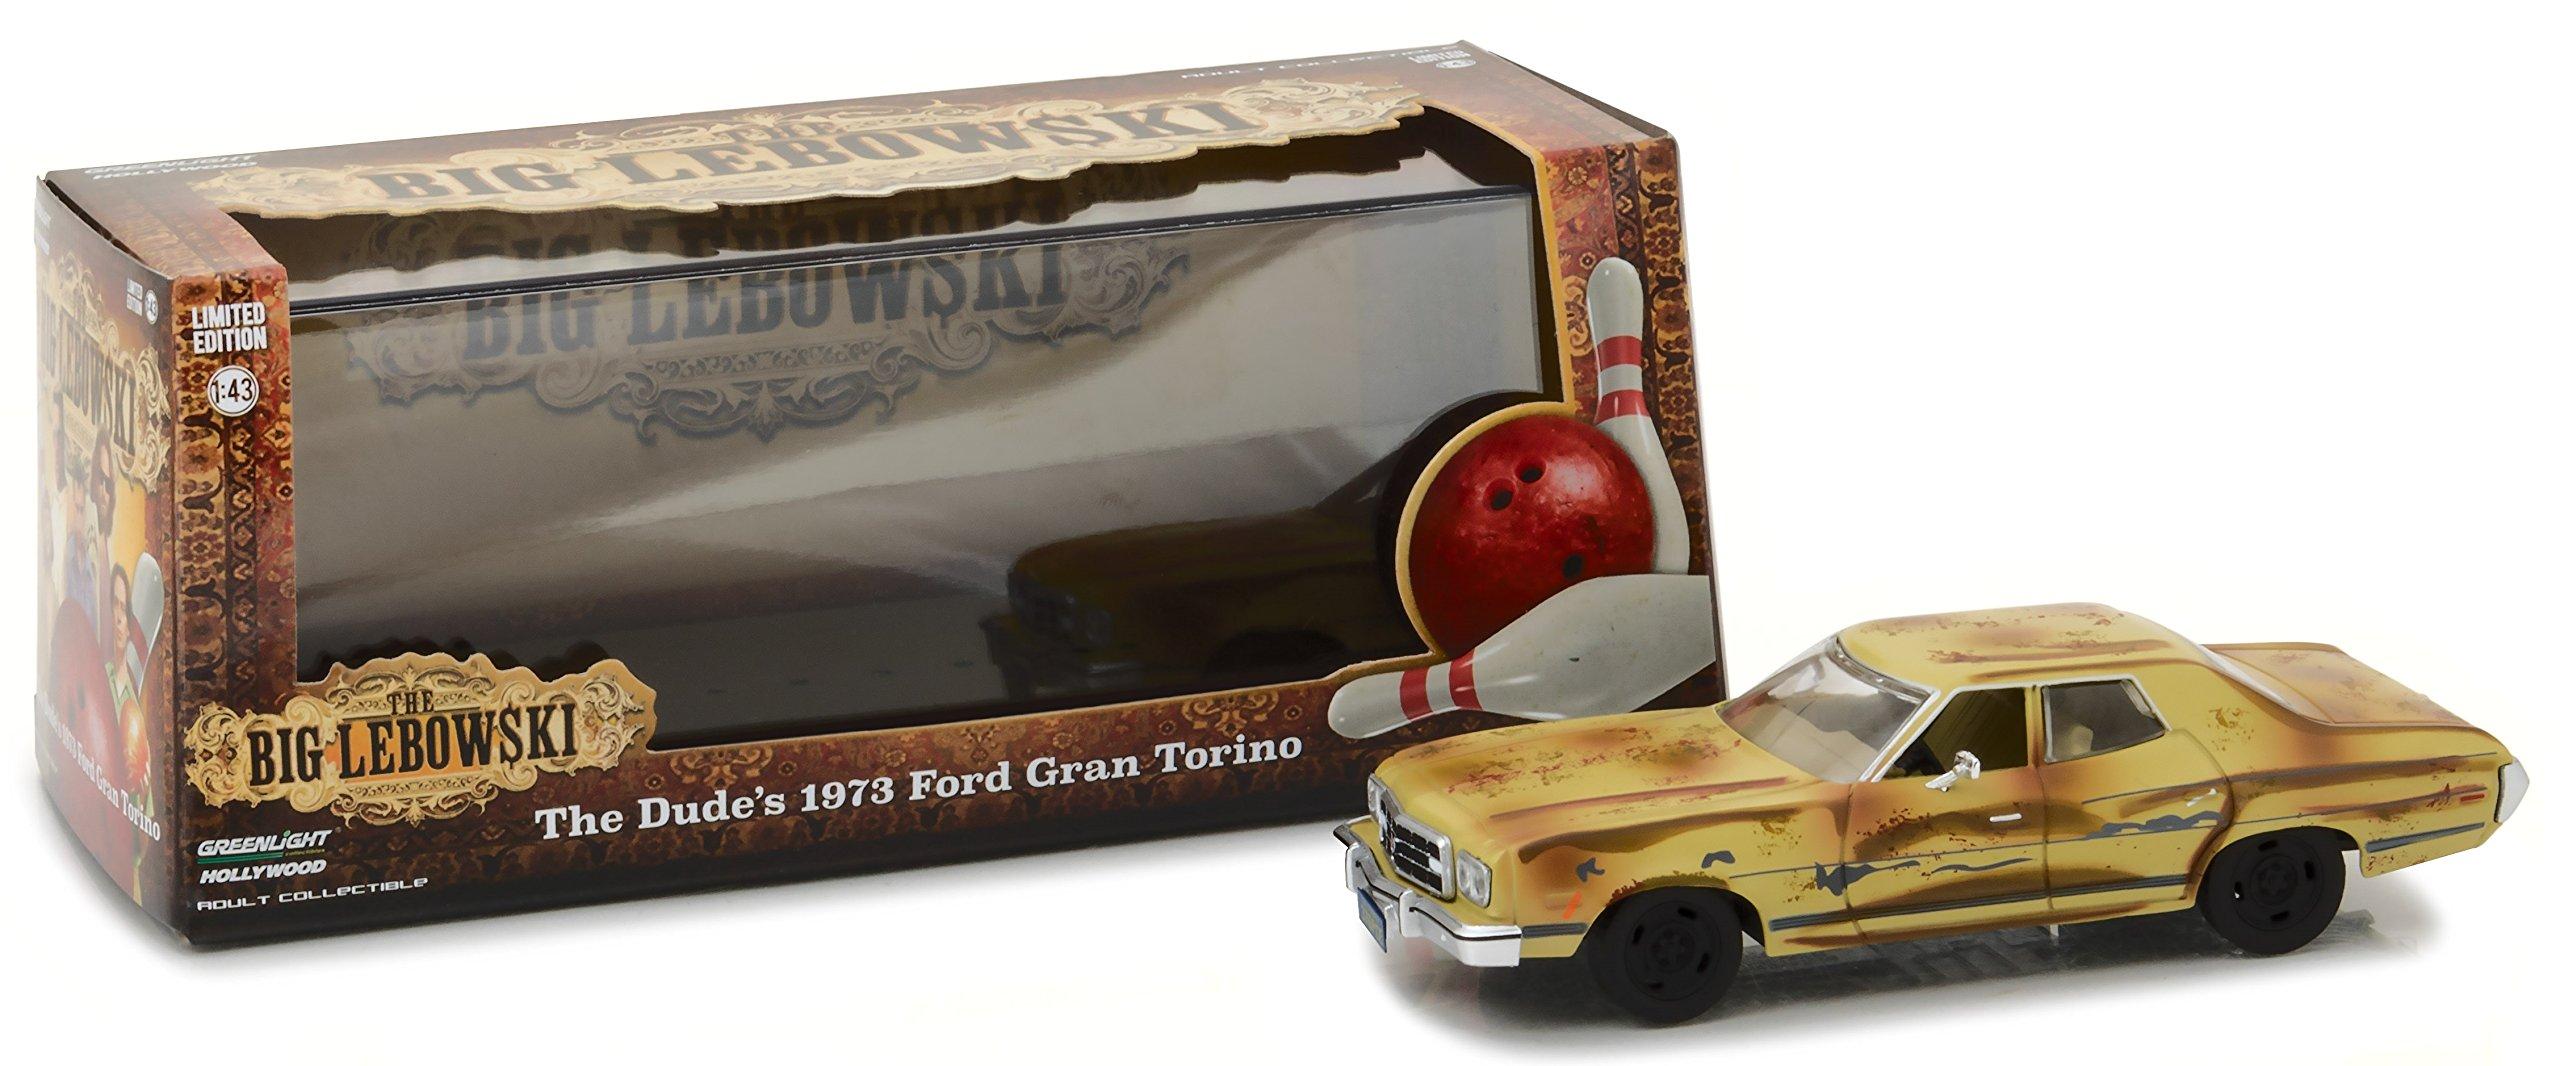 GreenLight - (1:43 Scale) The Big Lebowski (1998) - The Dude's 1973 Ford Gran Torino - 86495